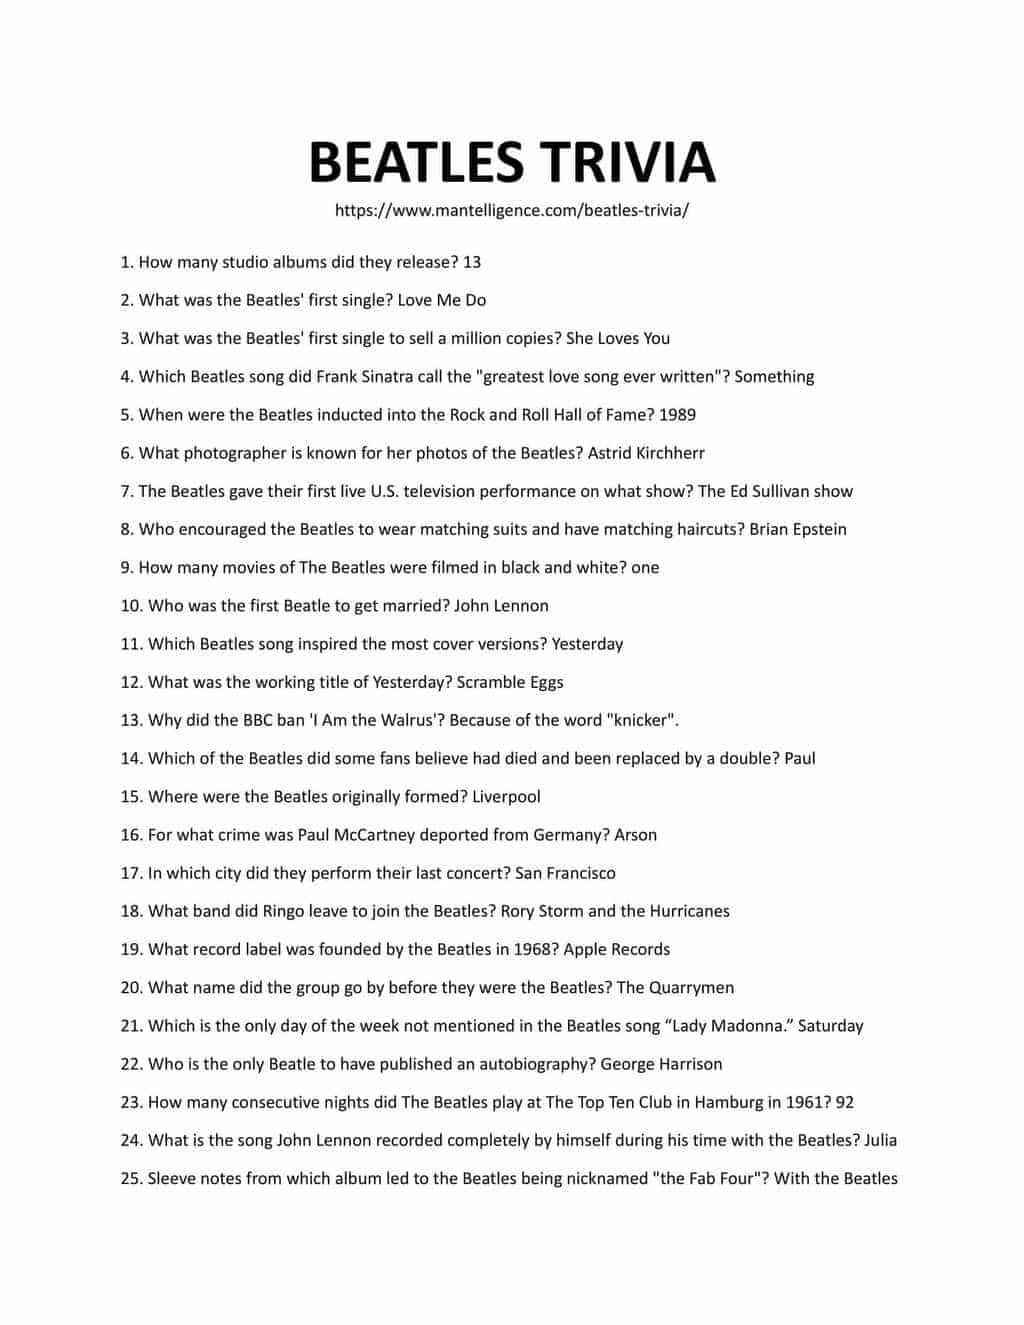 Downloadable and printable list of trivia